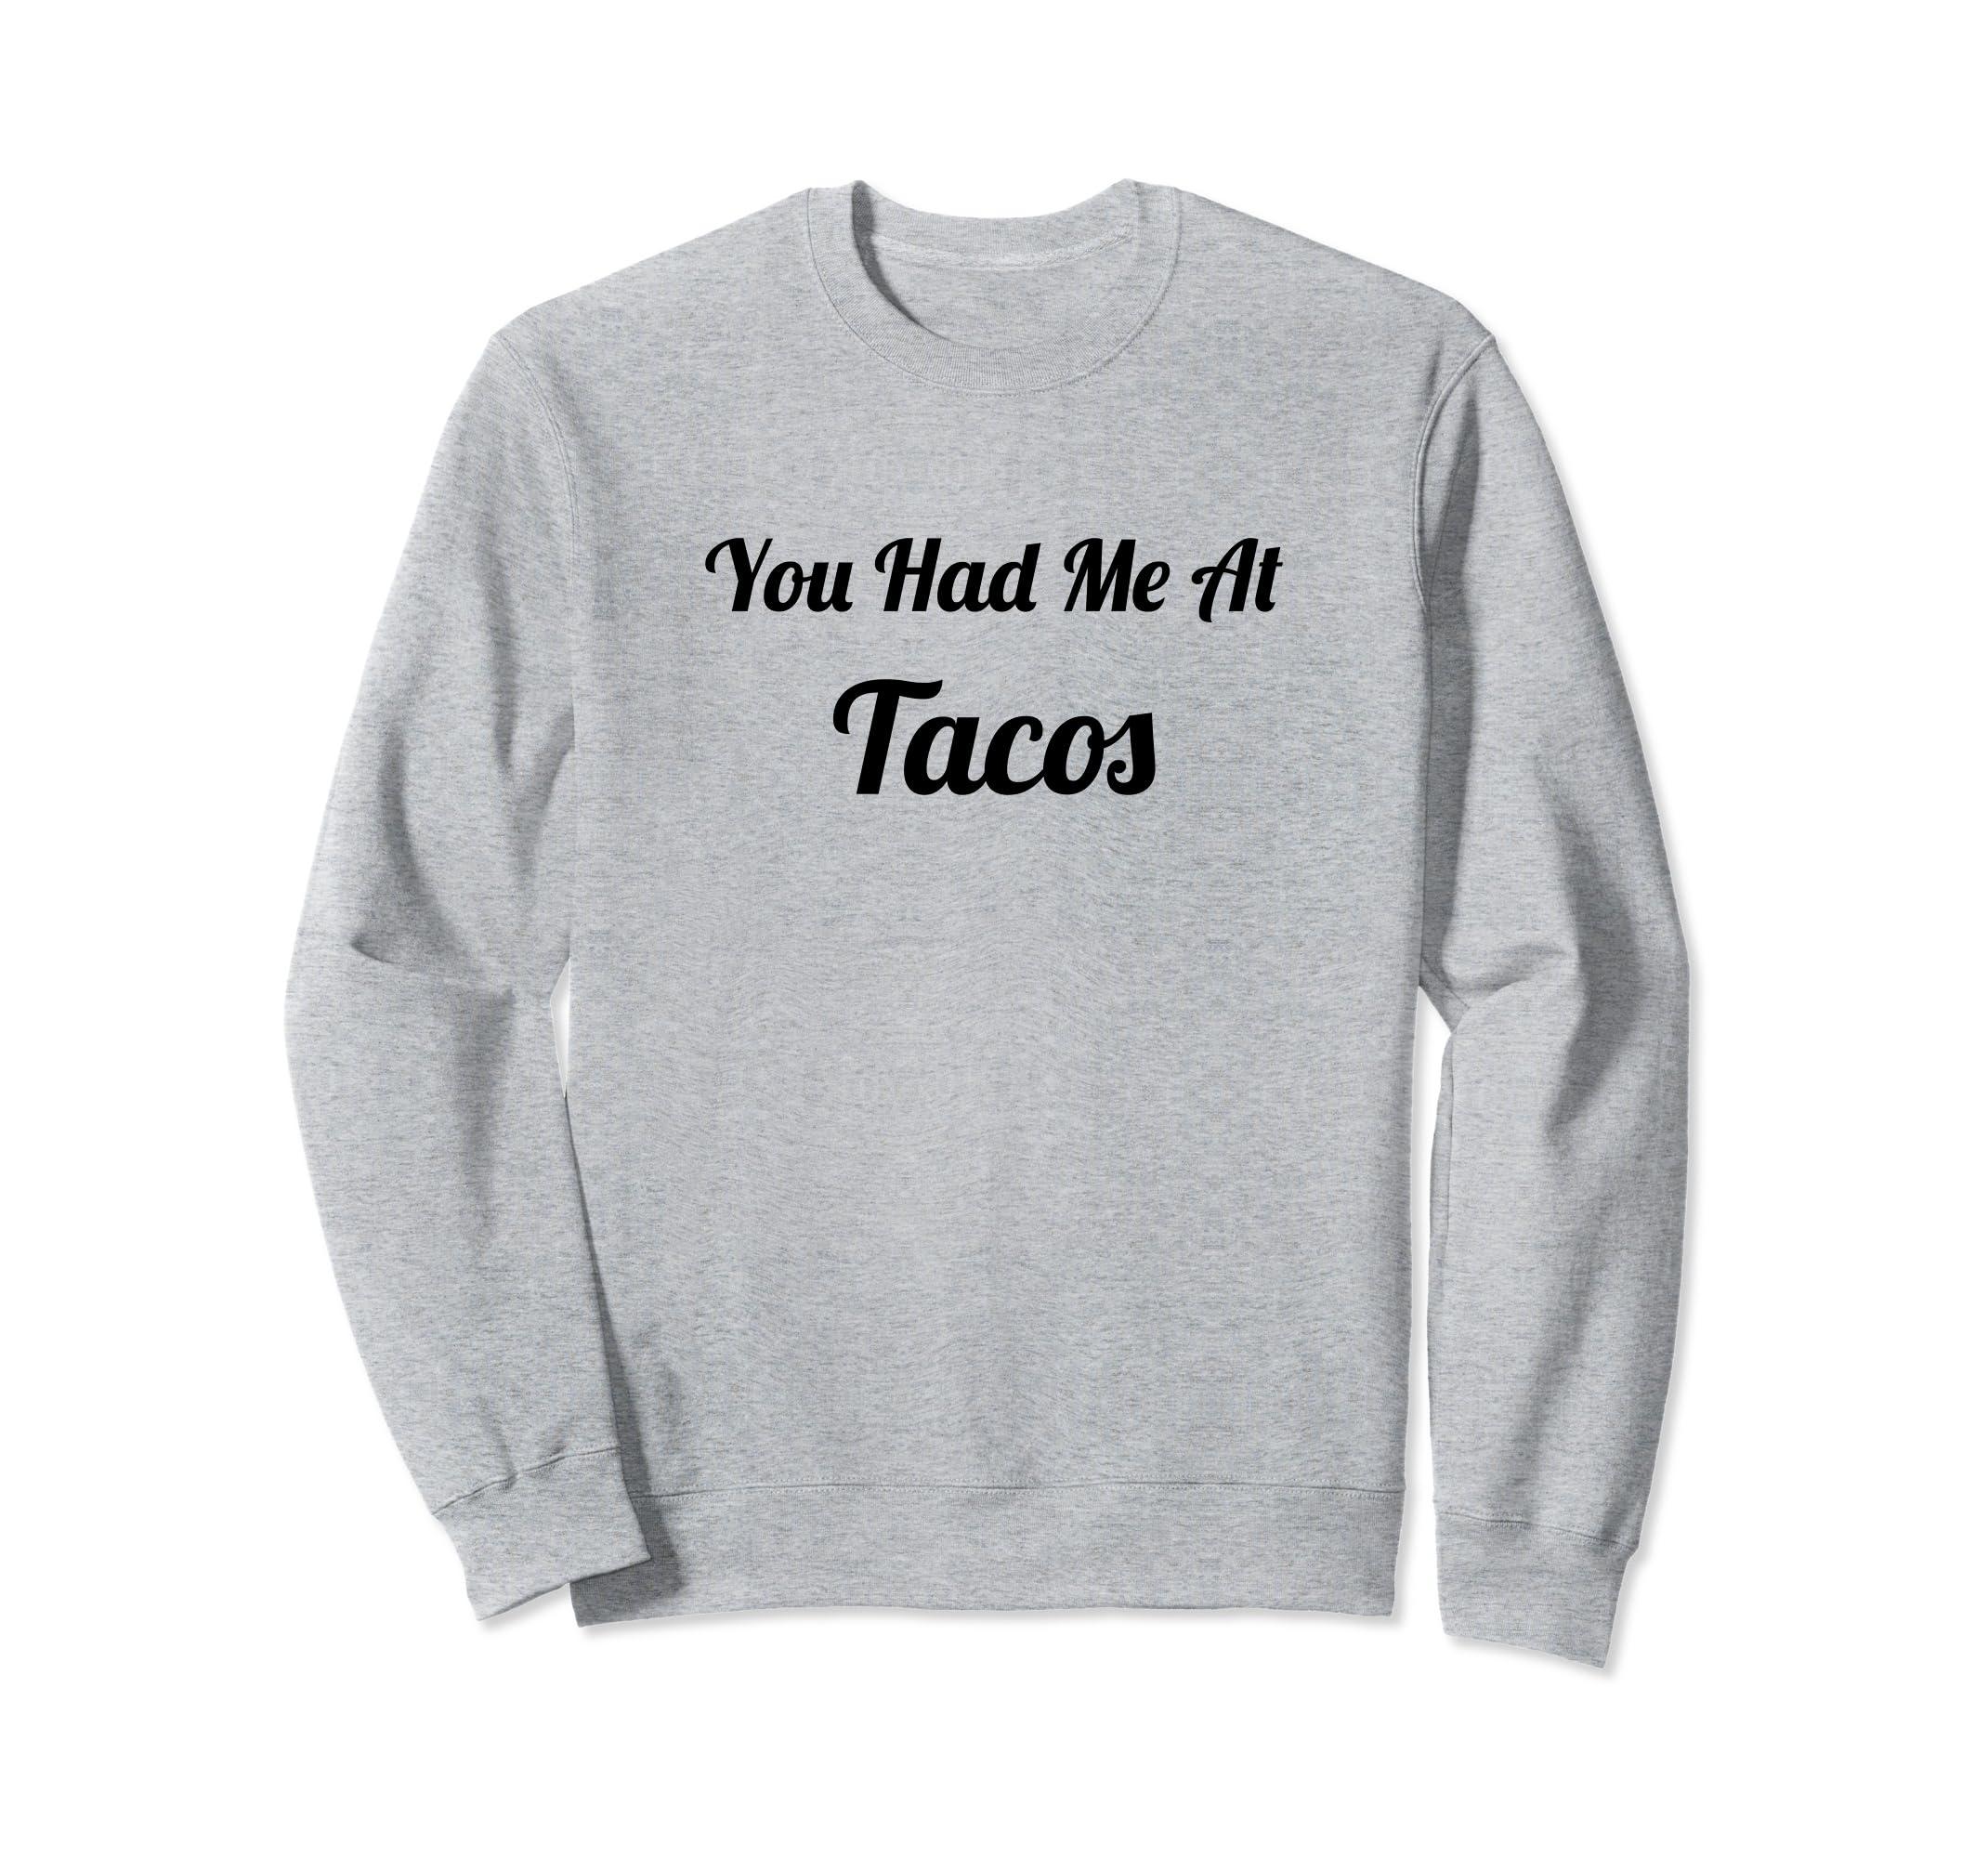 You Had Me At Tacos - Sweatshirt | Cute Sweater-SFL